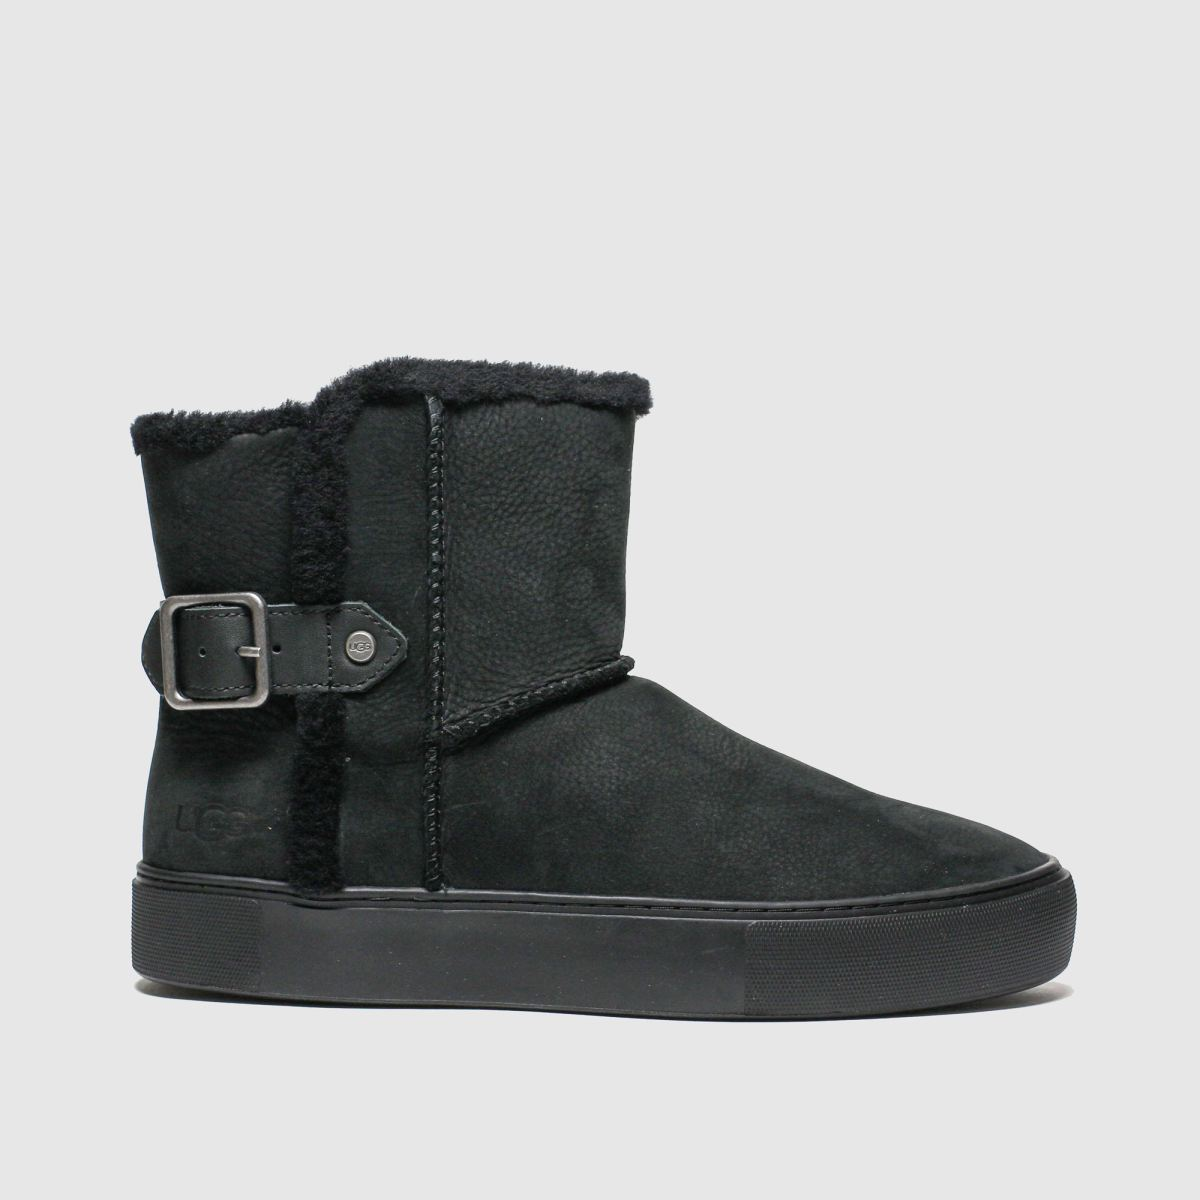 Ugg Black Akia Boots